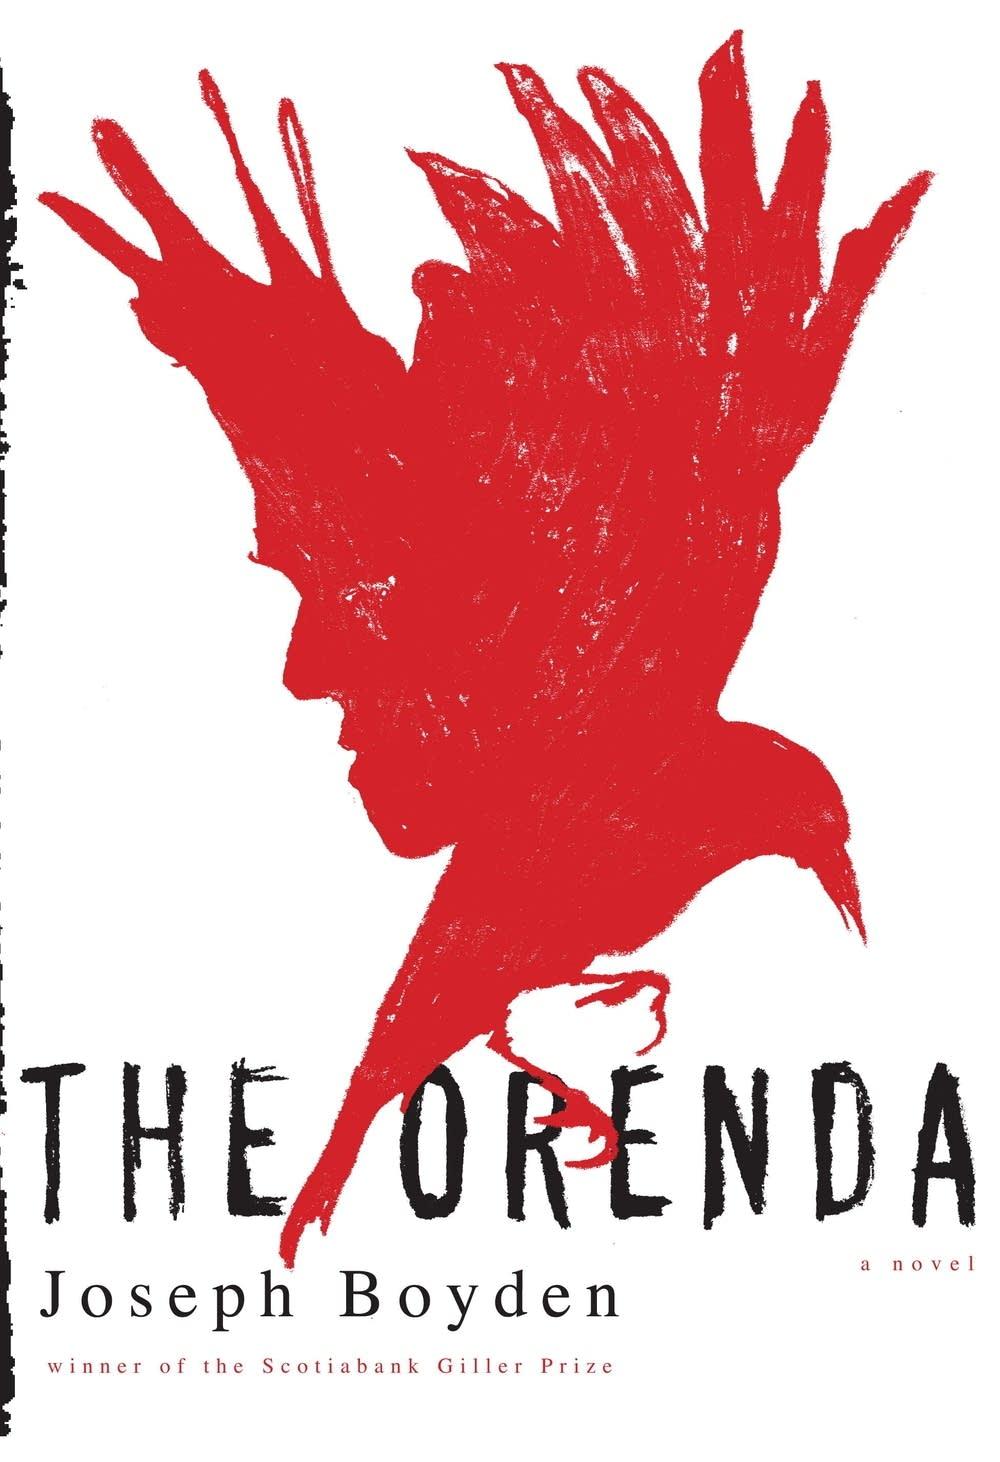 'The Orenda' by Joseph Boyden